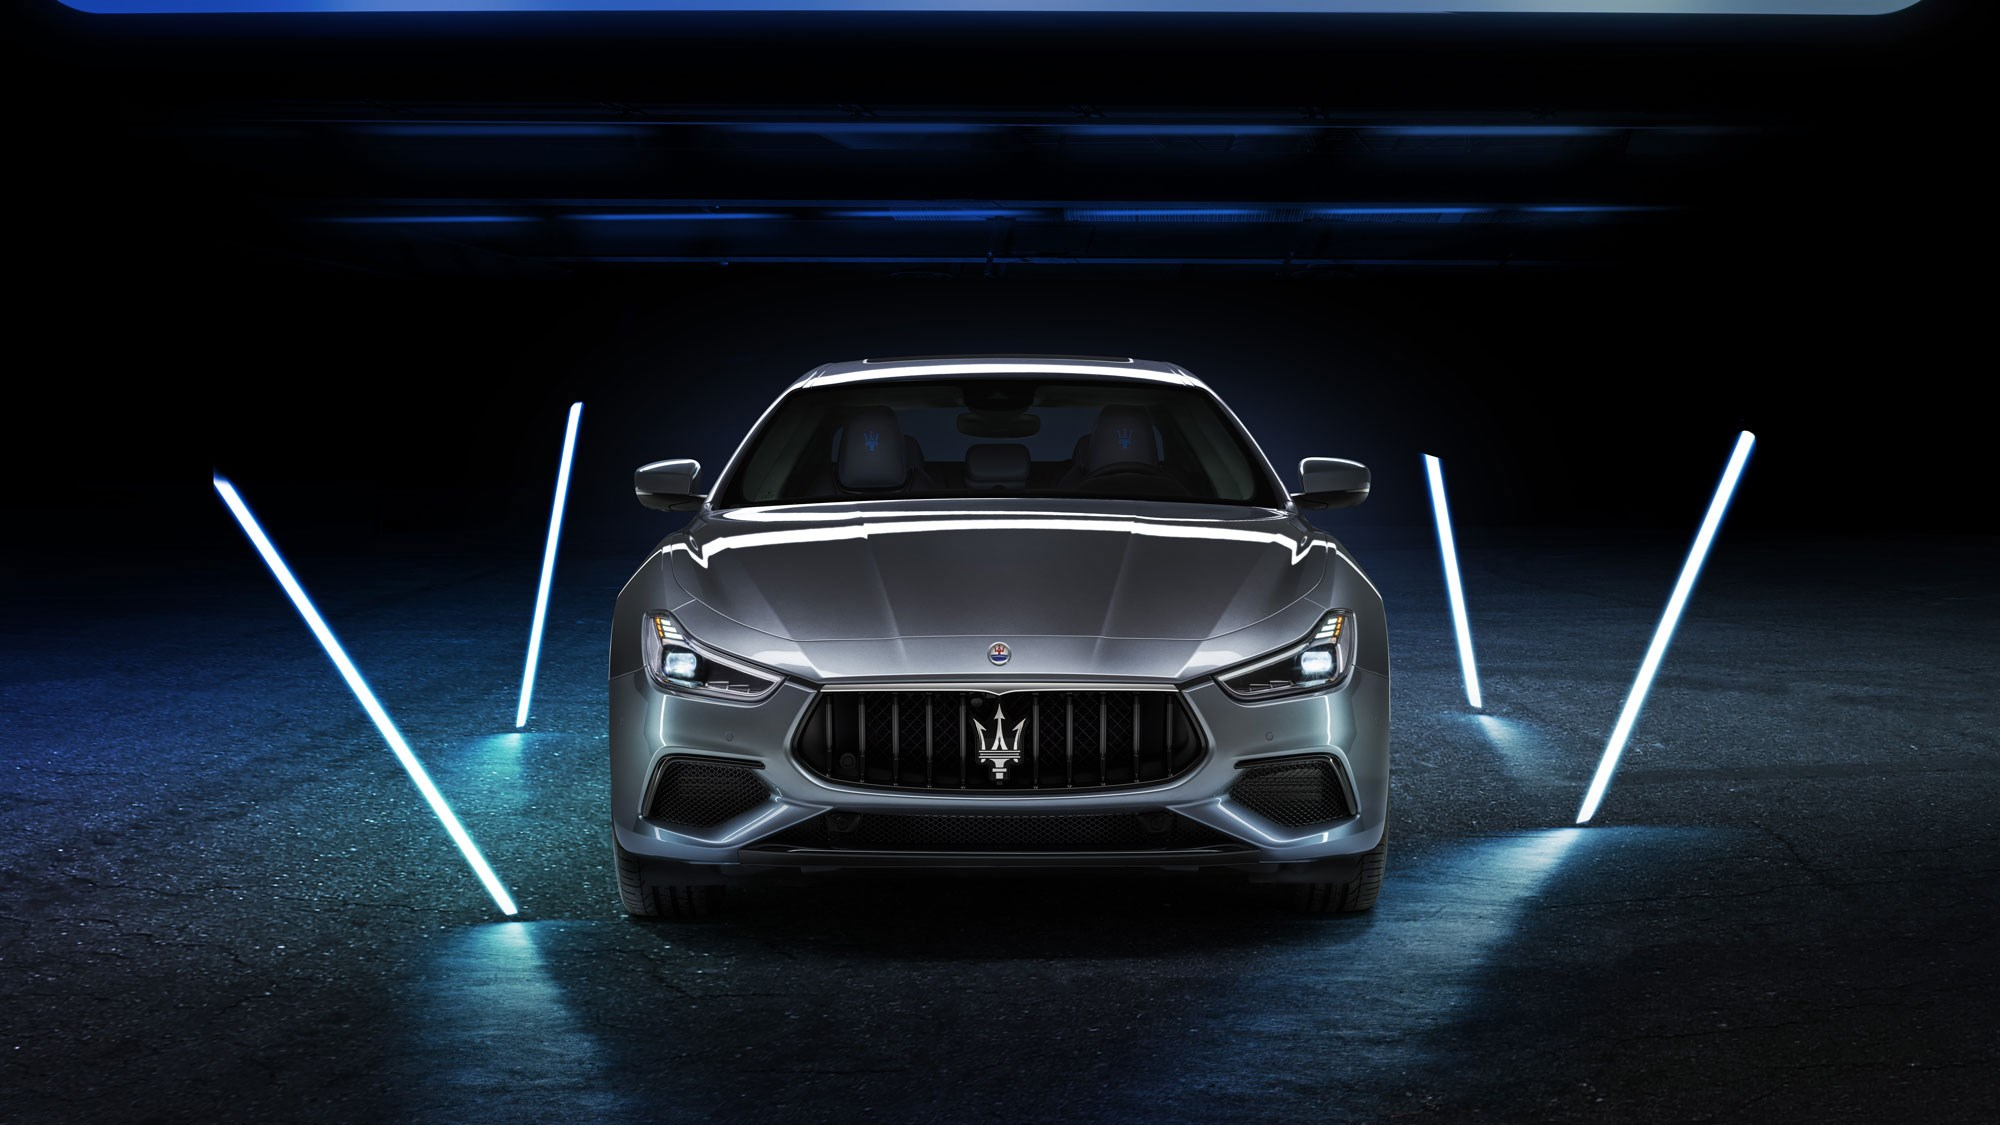 New Maserati Ghibli Hybrid begins brand's electrifed era